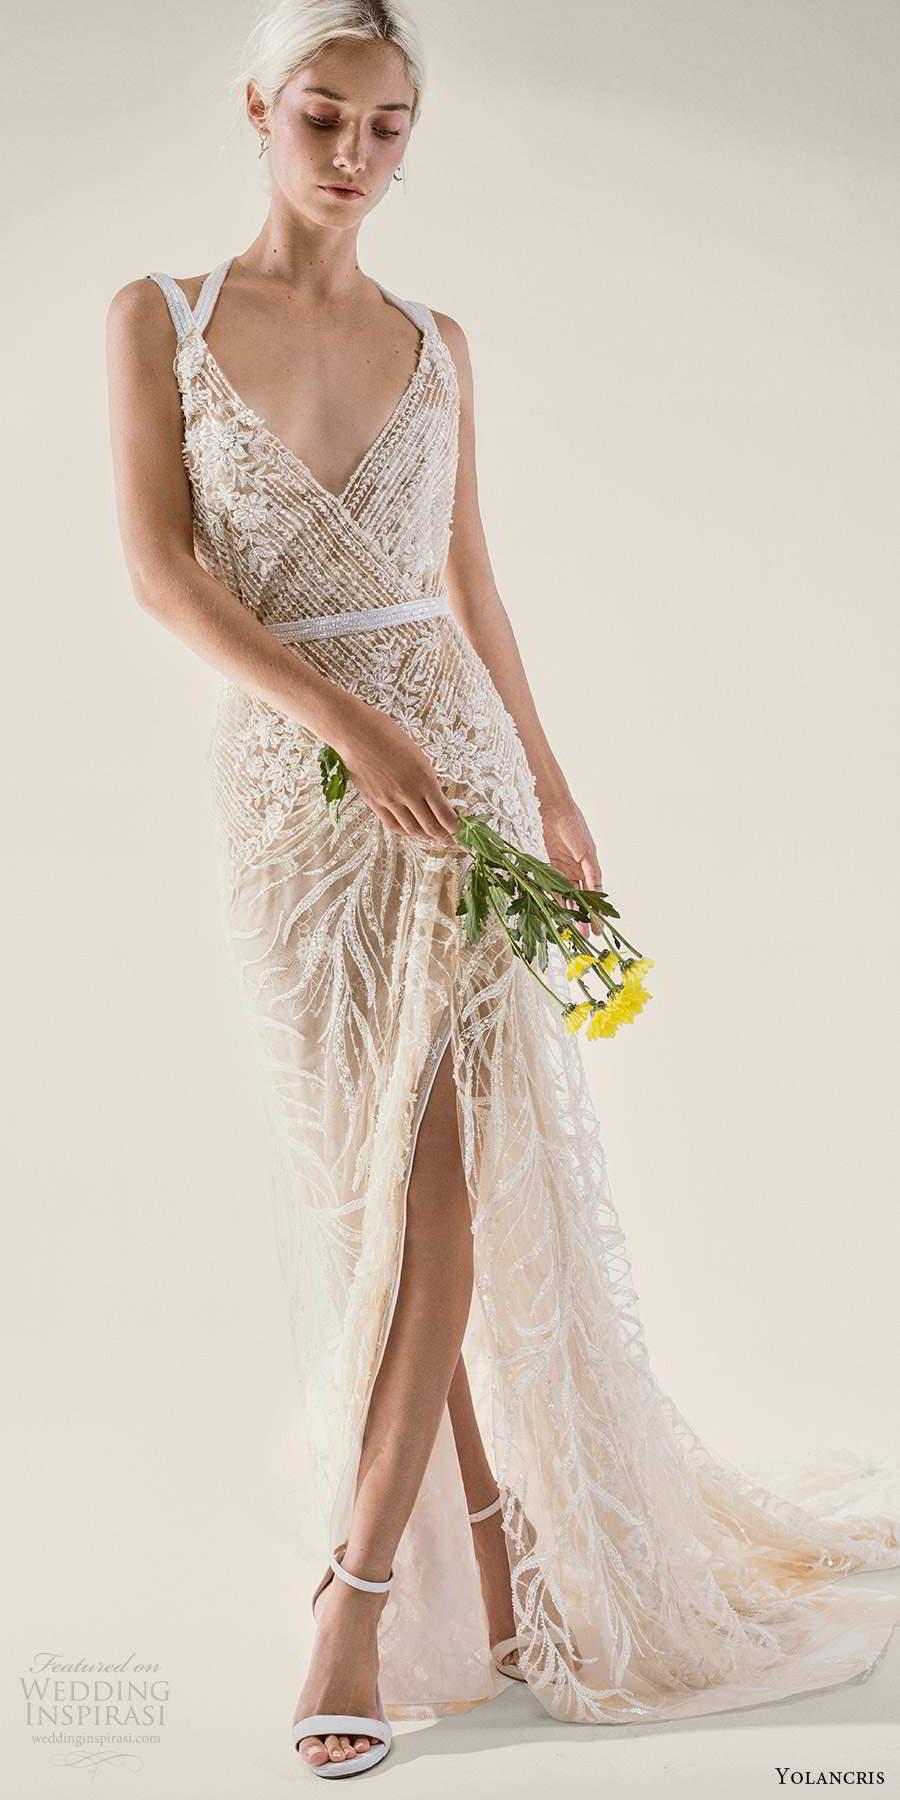 yolancris 2021 bridal sleeveless double straps v neckline fully embellished sheath wedding dress chapel train (3) mv